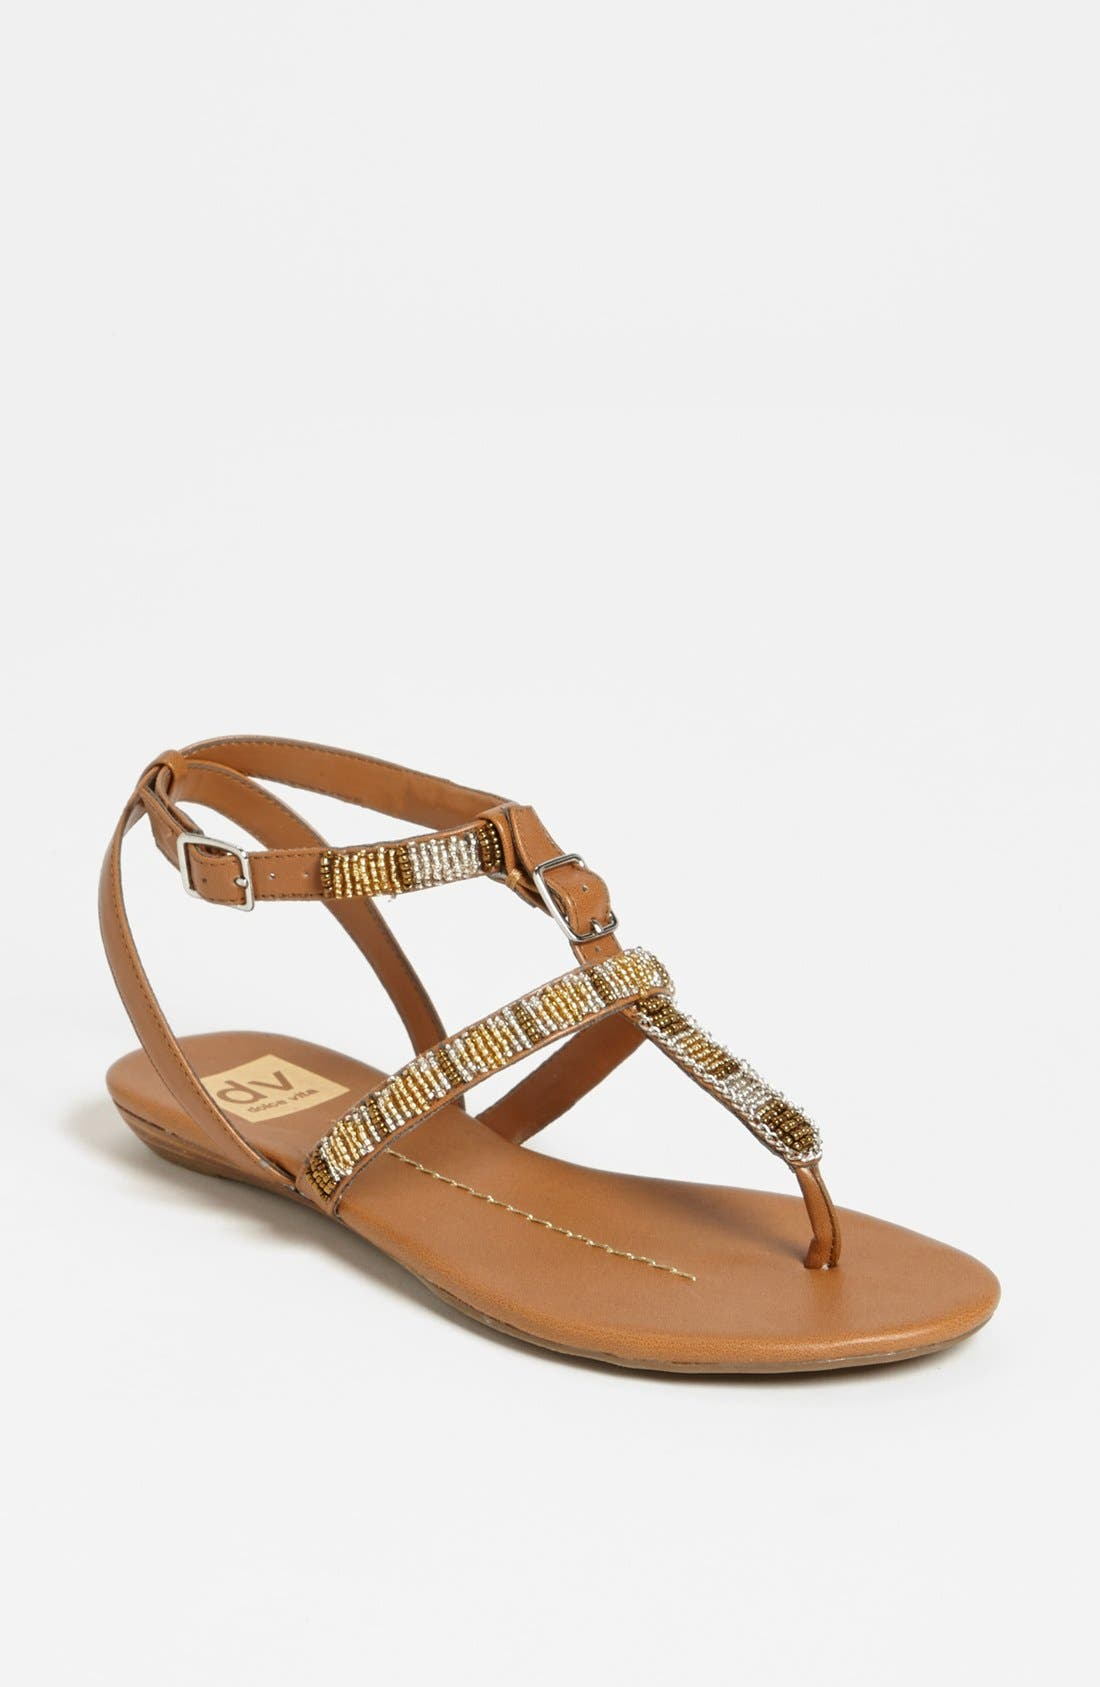 Main Image - DV by Dolce Vita 'Austen' Sandal